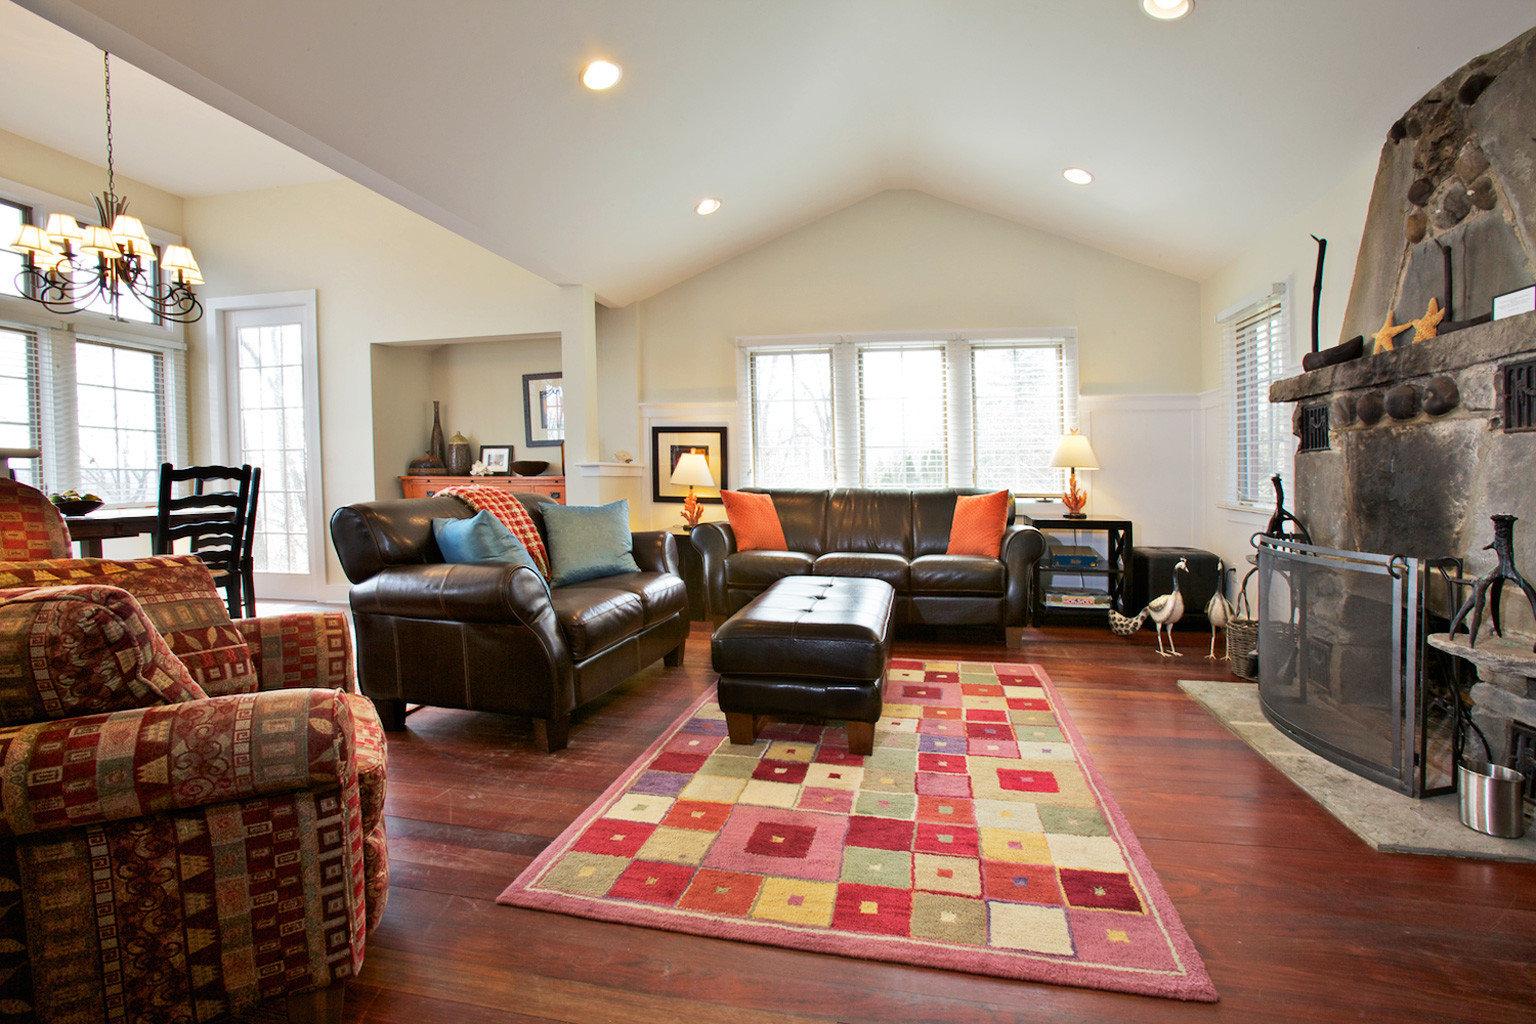 B&B Inn Lounge Outdoor Activities Waterfront Wellness living room property home hardwood flooring wood flooring cottage rug